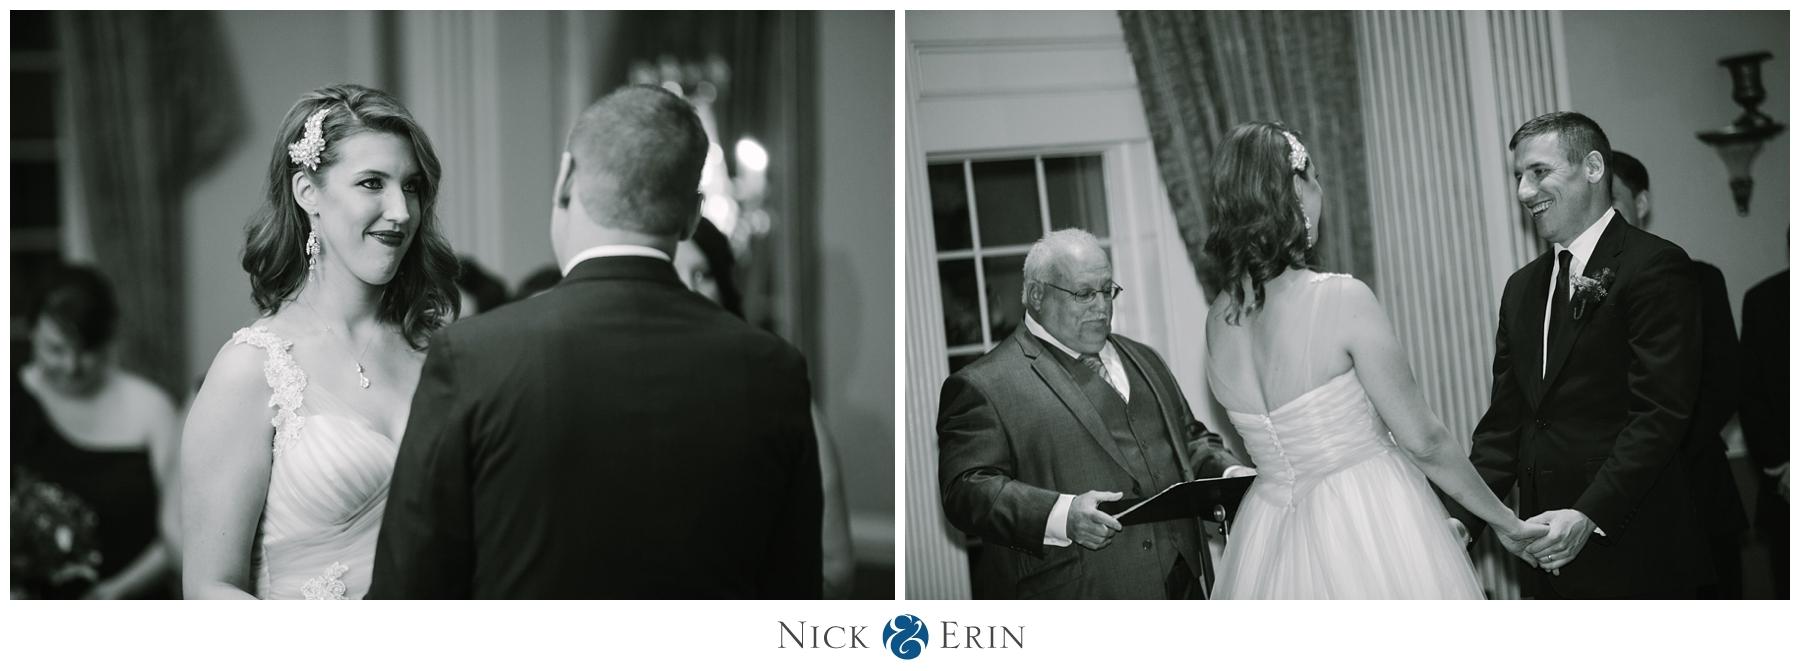 Donner_Photography_Mendenhall Inn Wedding_Blake & Kristina_0033